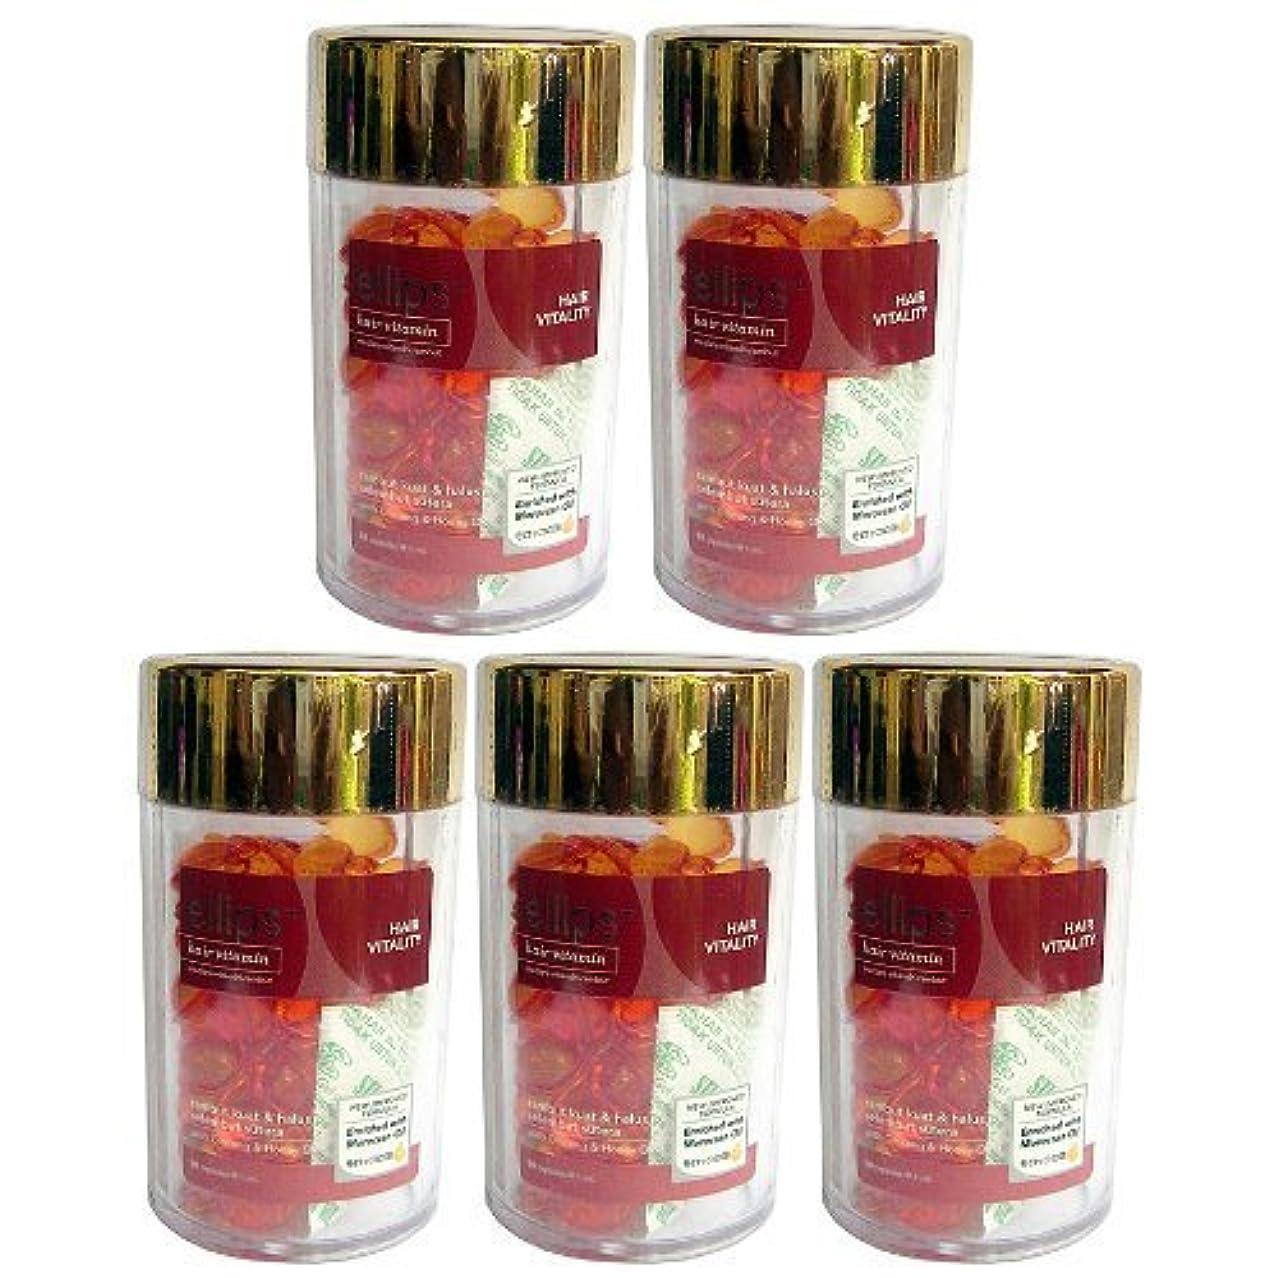 Ellips(エリプス)ヘアビタミン(50粒入)5個セット [並行輸入品][海外直送品] ブラウン